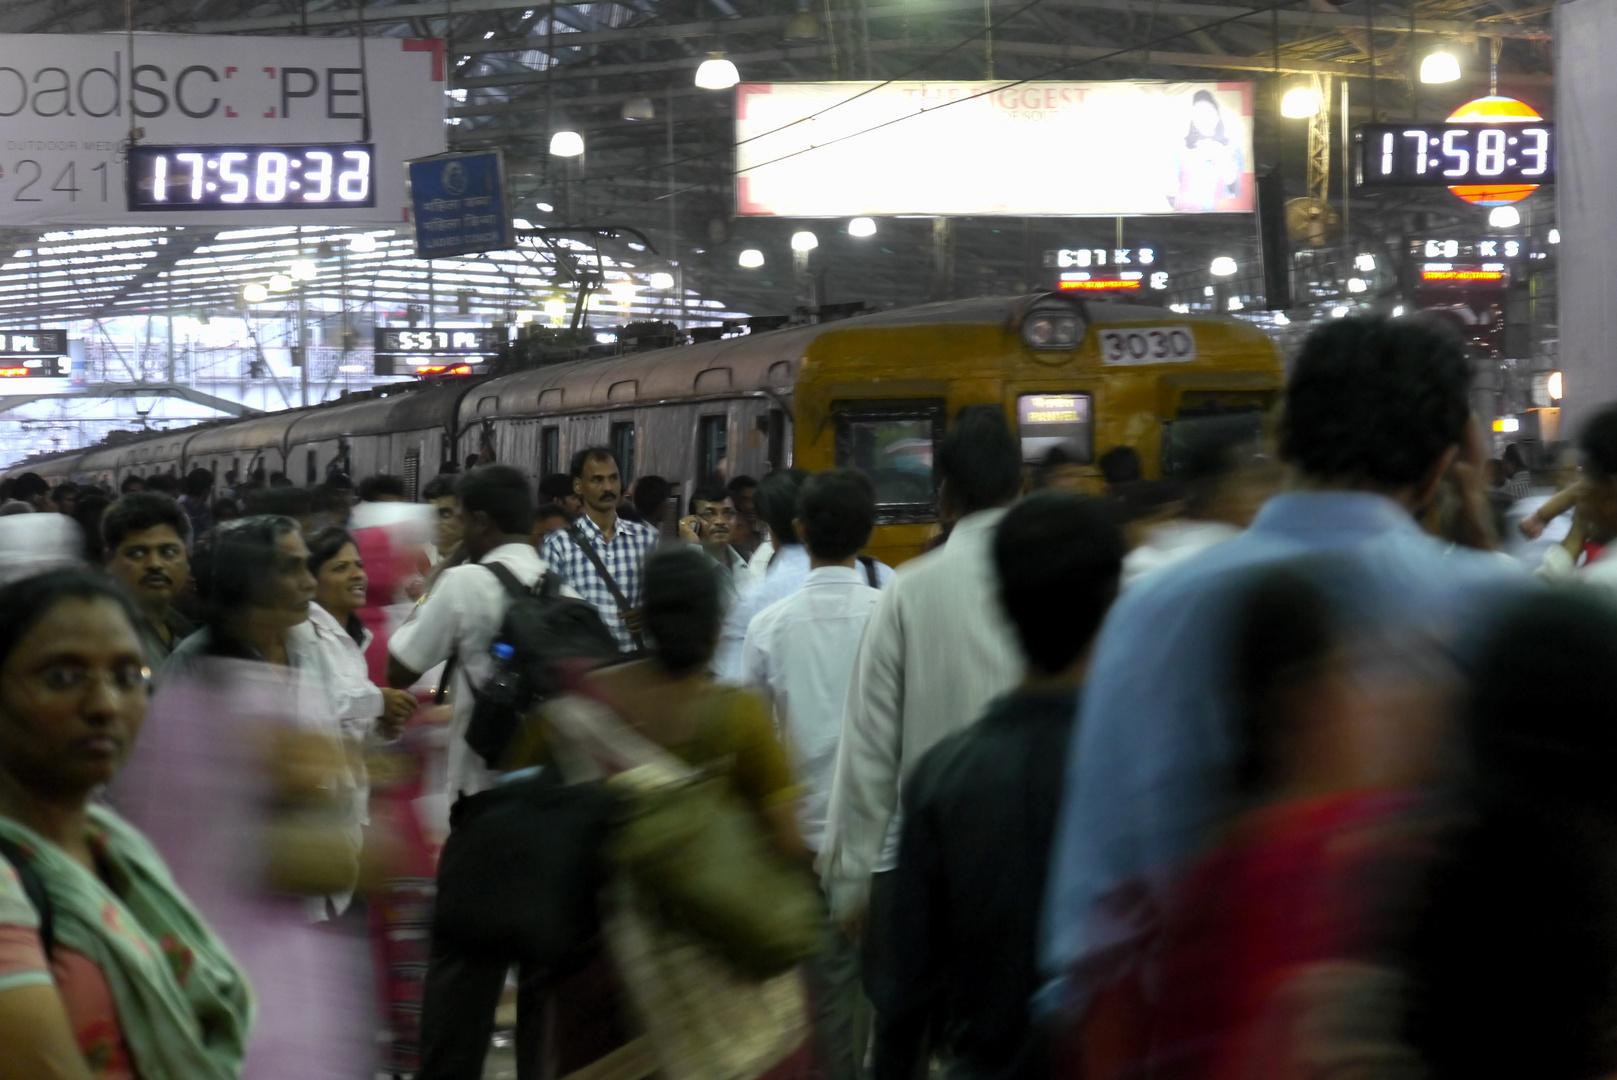 Chhatrapati Shivaji Terminus (ehemals Victoria Terminus)